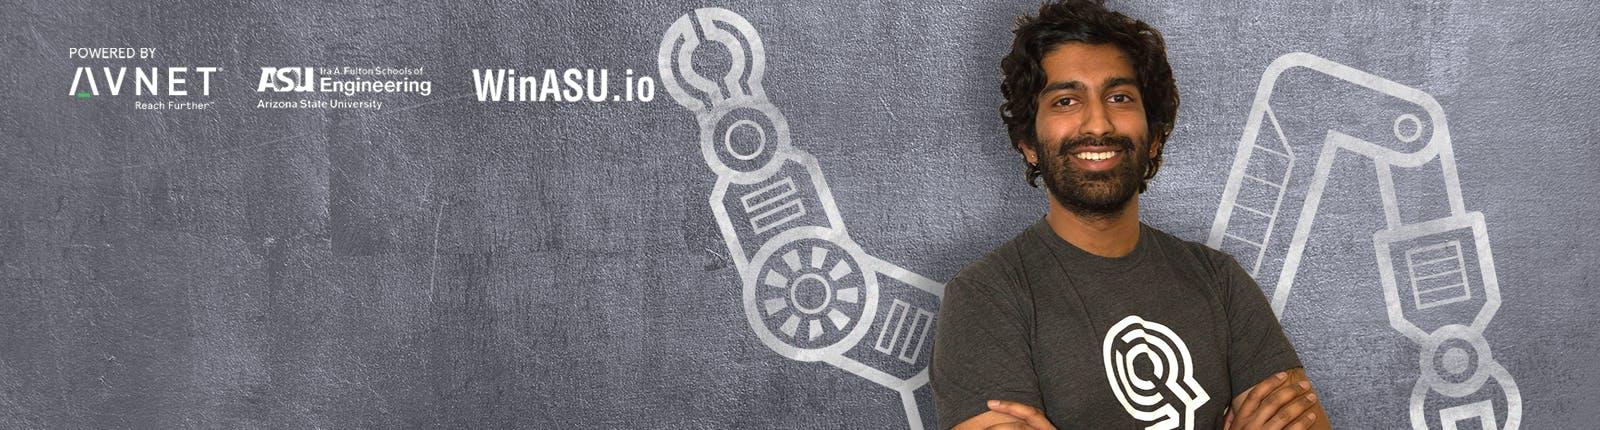 Asuio banner ad hackster v2 jghtri7iif